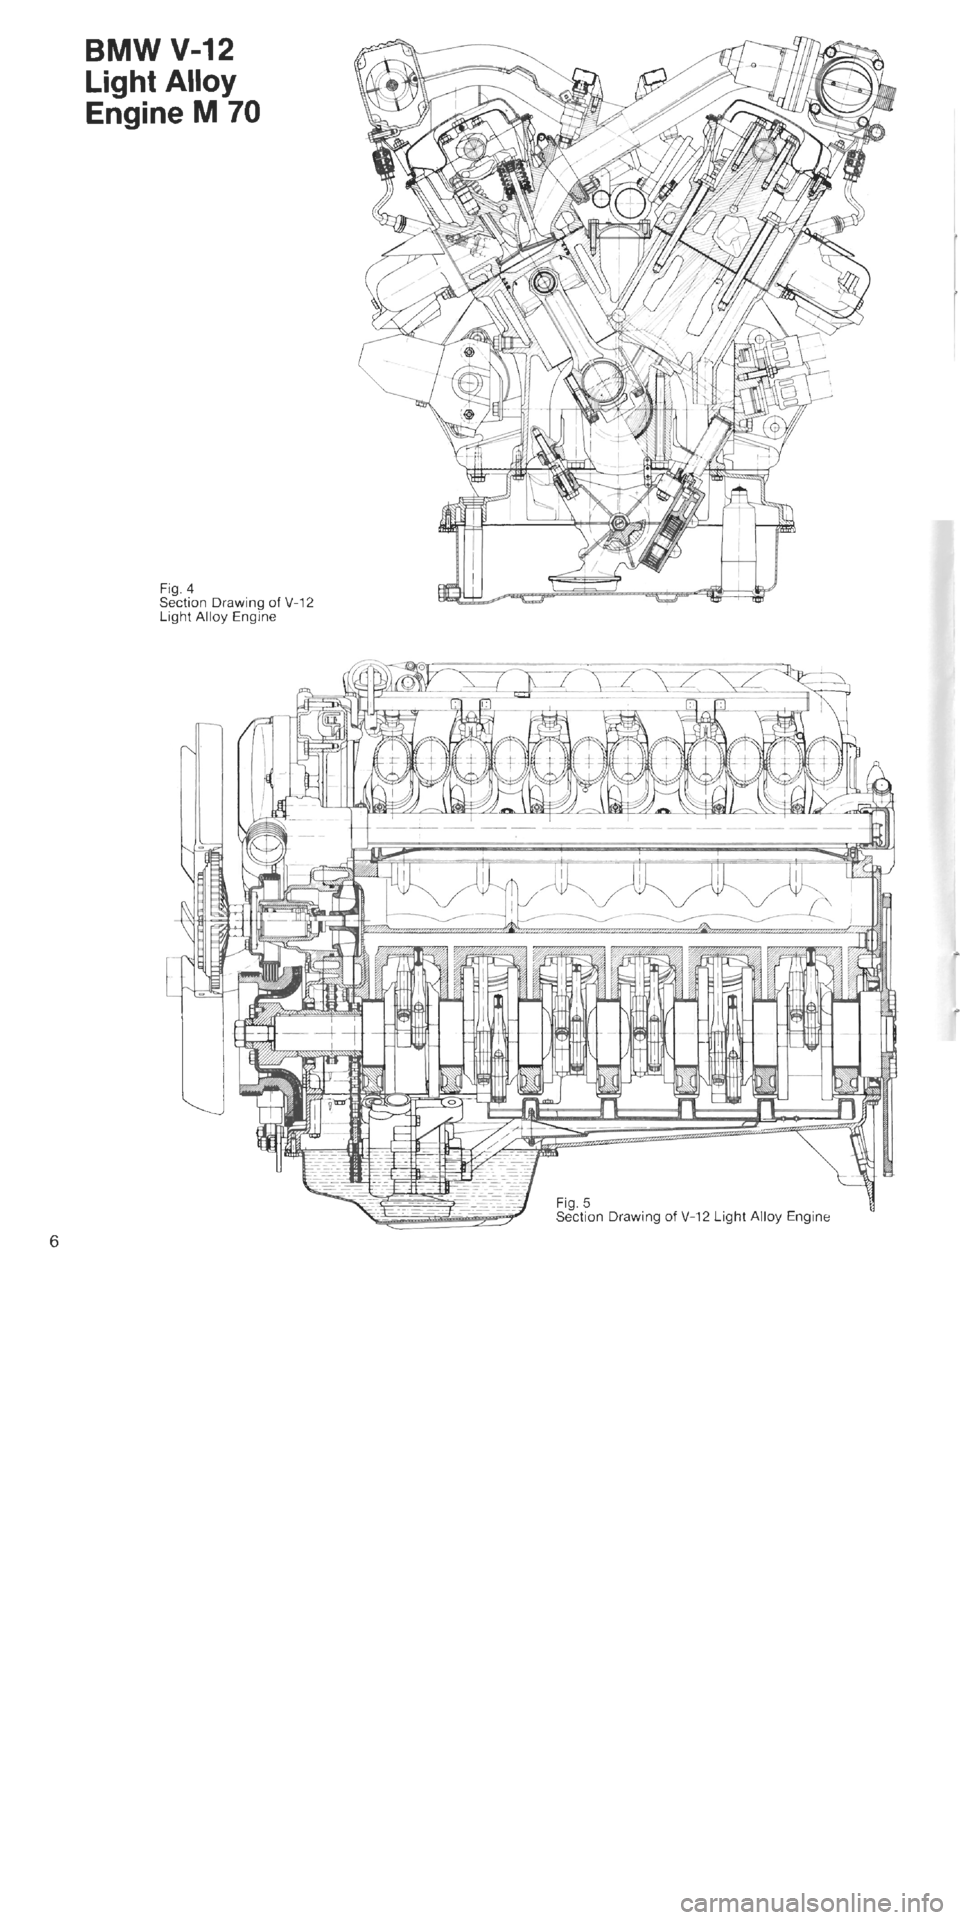 bmw 3.0s engine manual